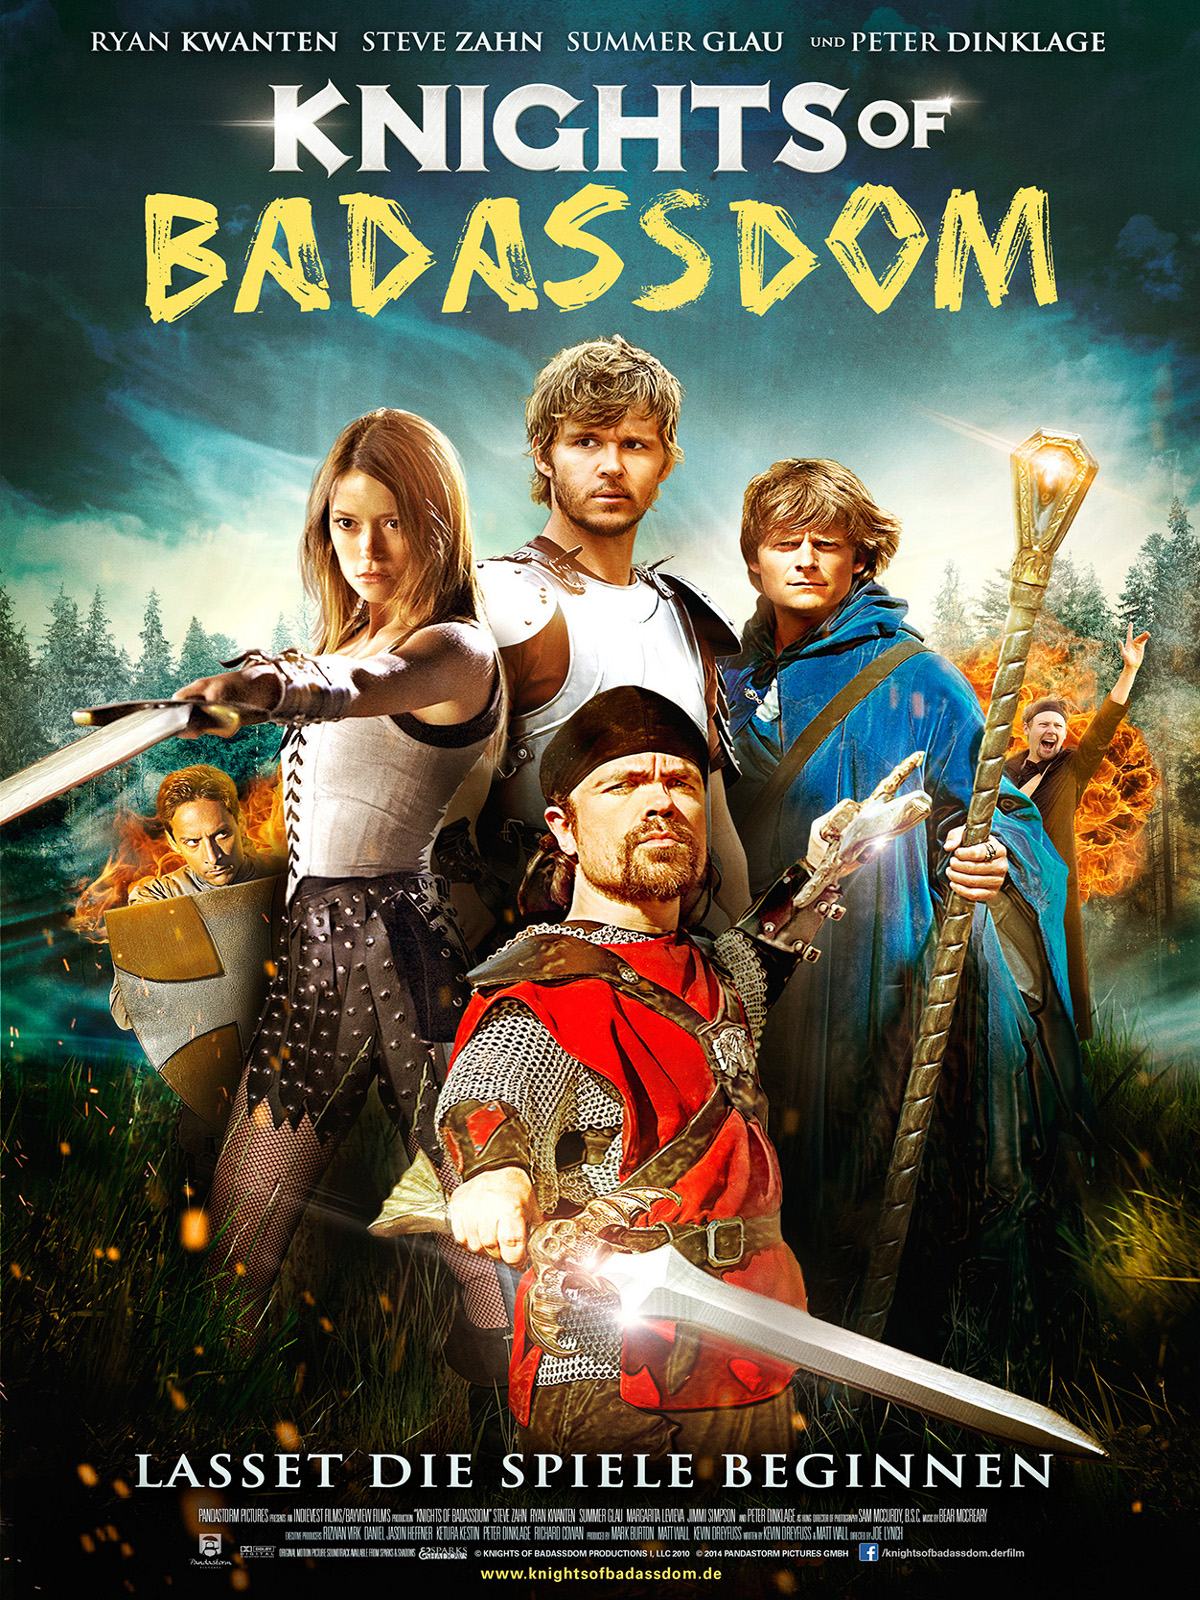 Knights of Badassdom อัศวินสุดเพี้ยน เกรียนกู้โลก [HD][พากย์ไทย]